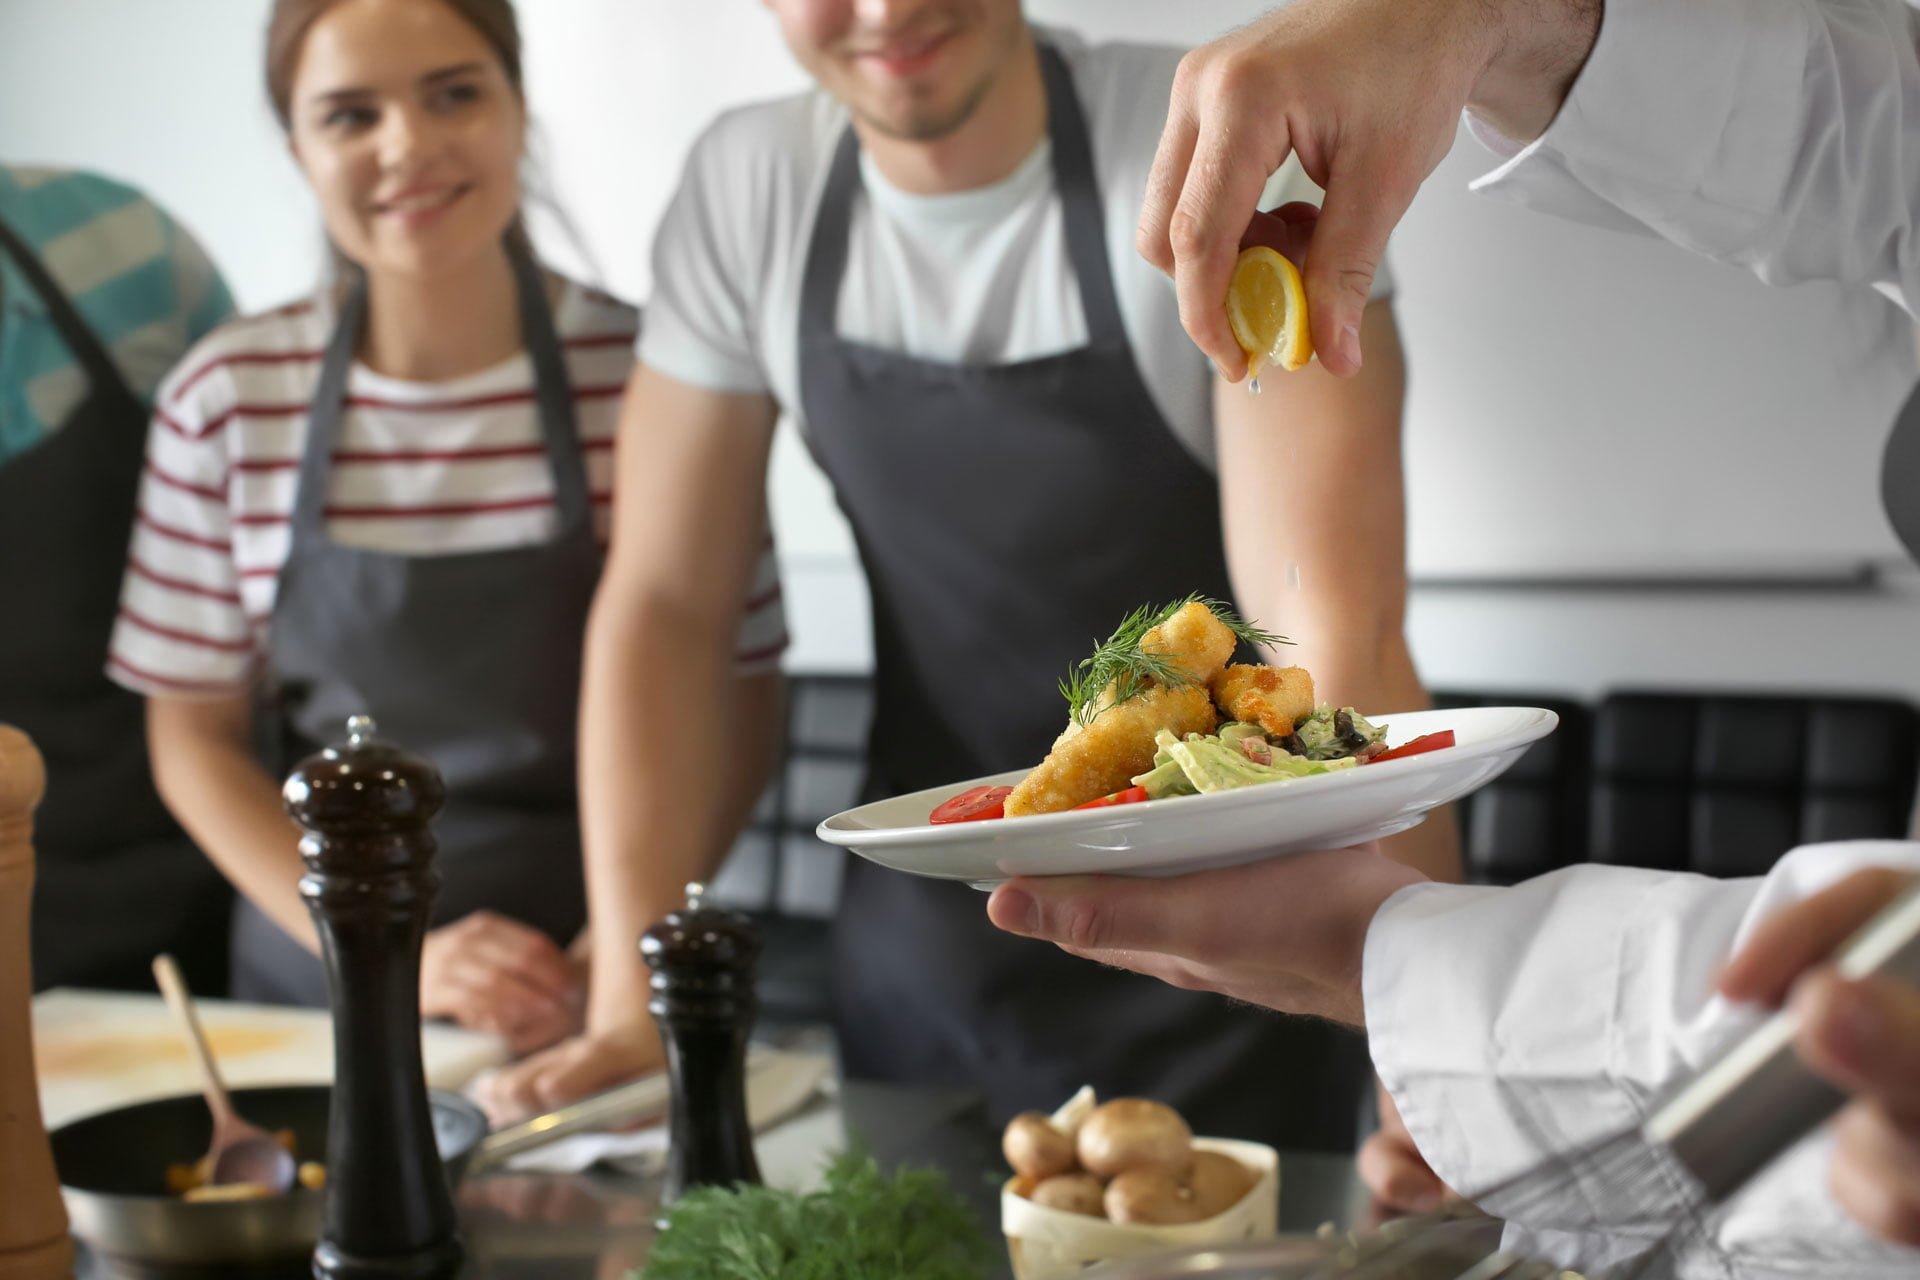 Cook preparing gourmet meal